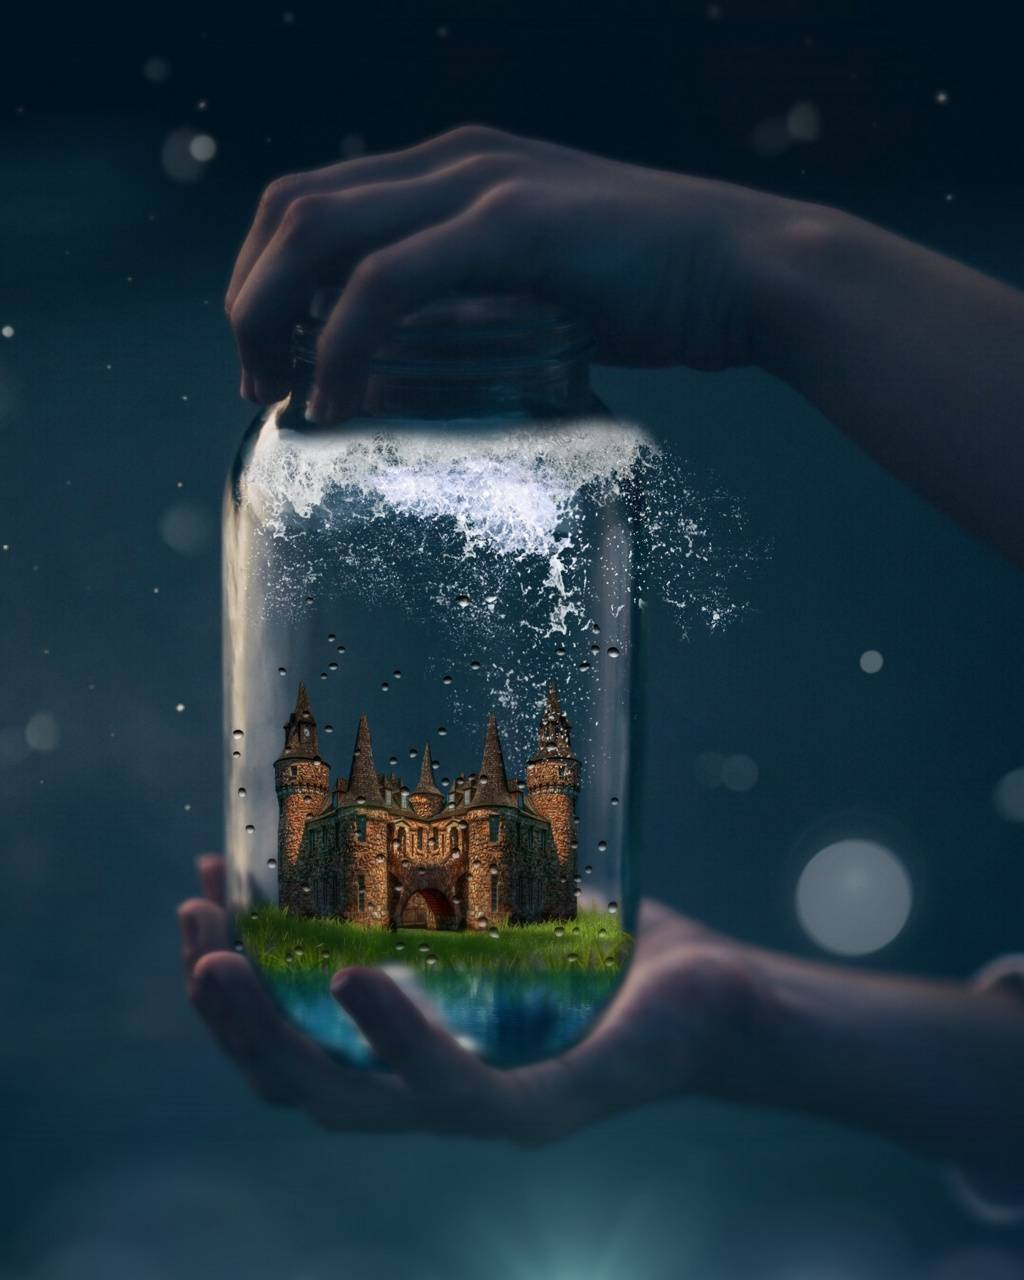 Castle bottle